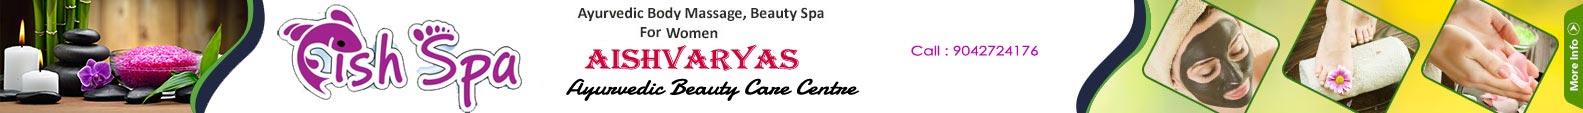 Theni-Fish-Pedicure-Service-Ladies-Massage-Centre